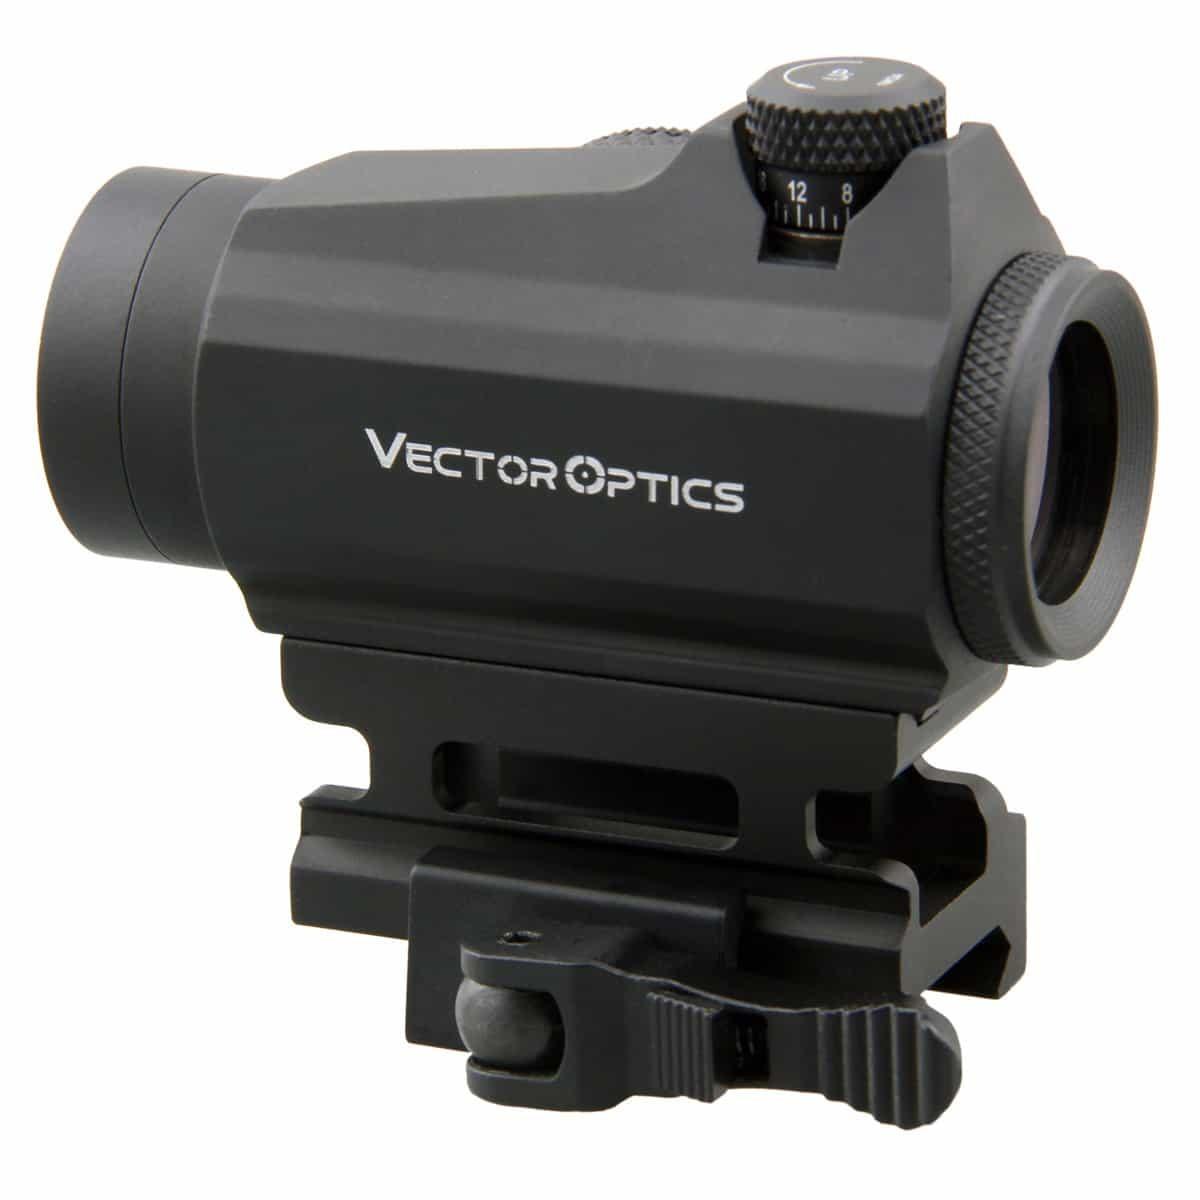 Red Dot Vector Optics Maverick 1x22 GenII